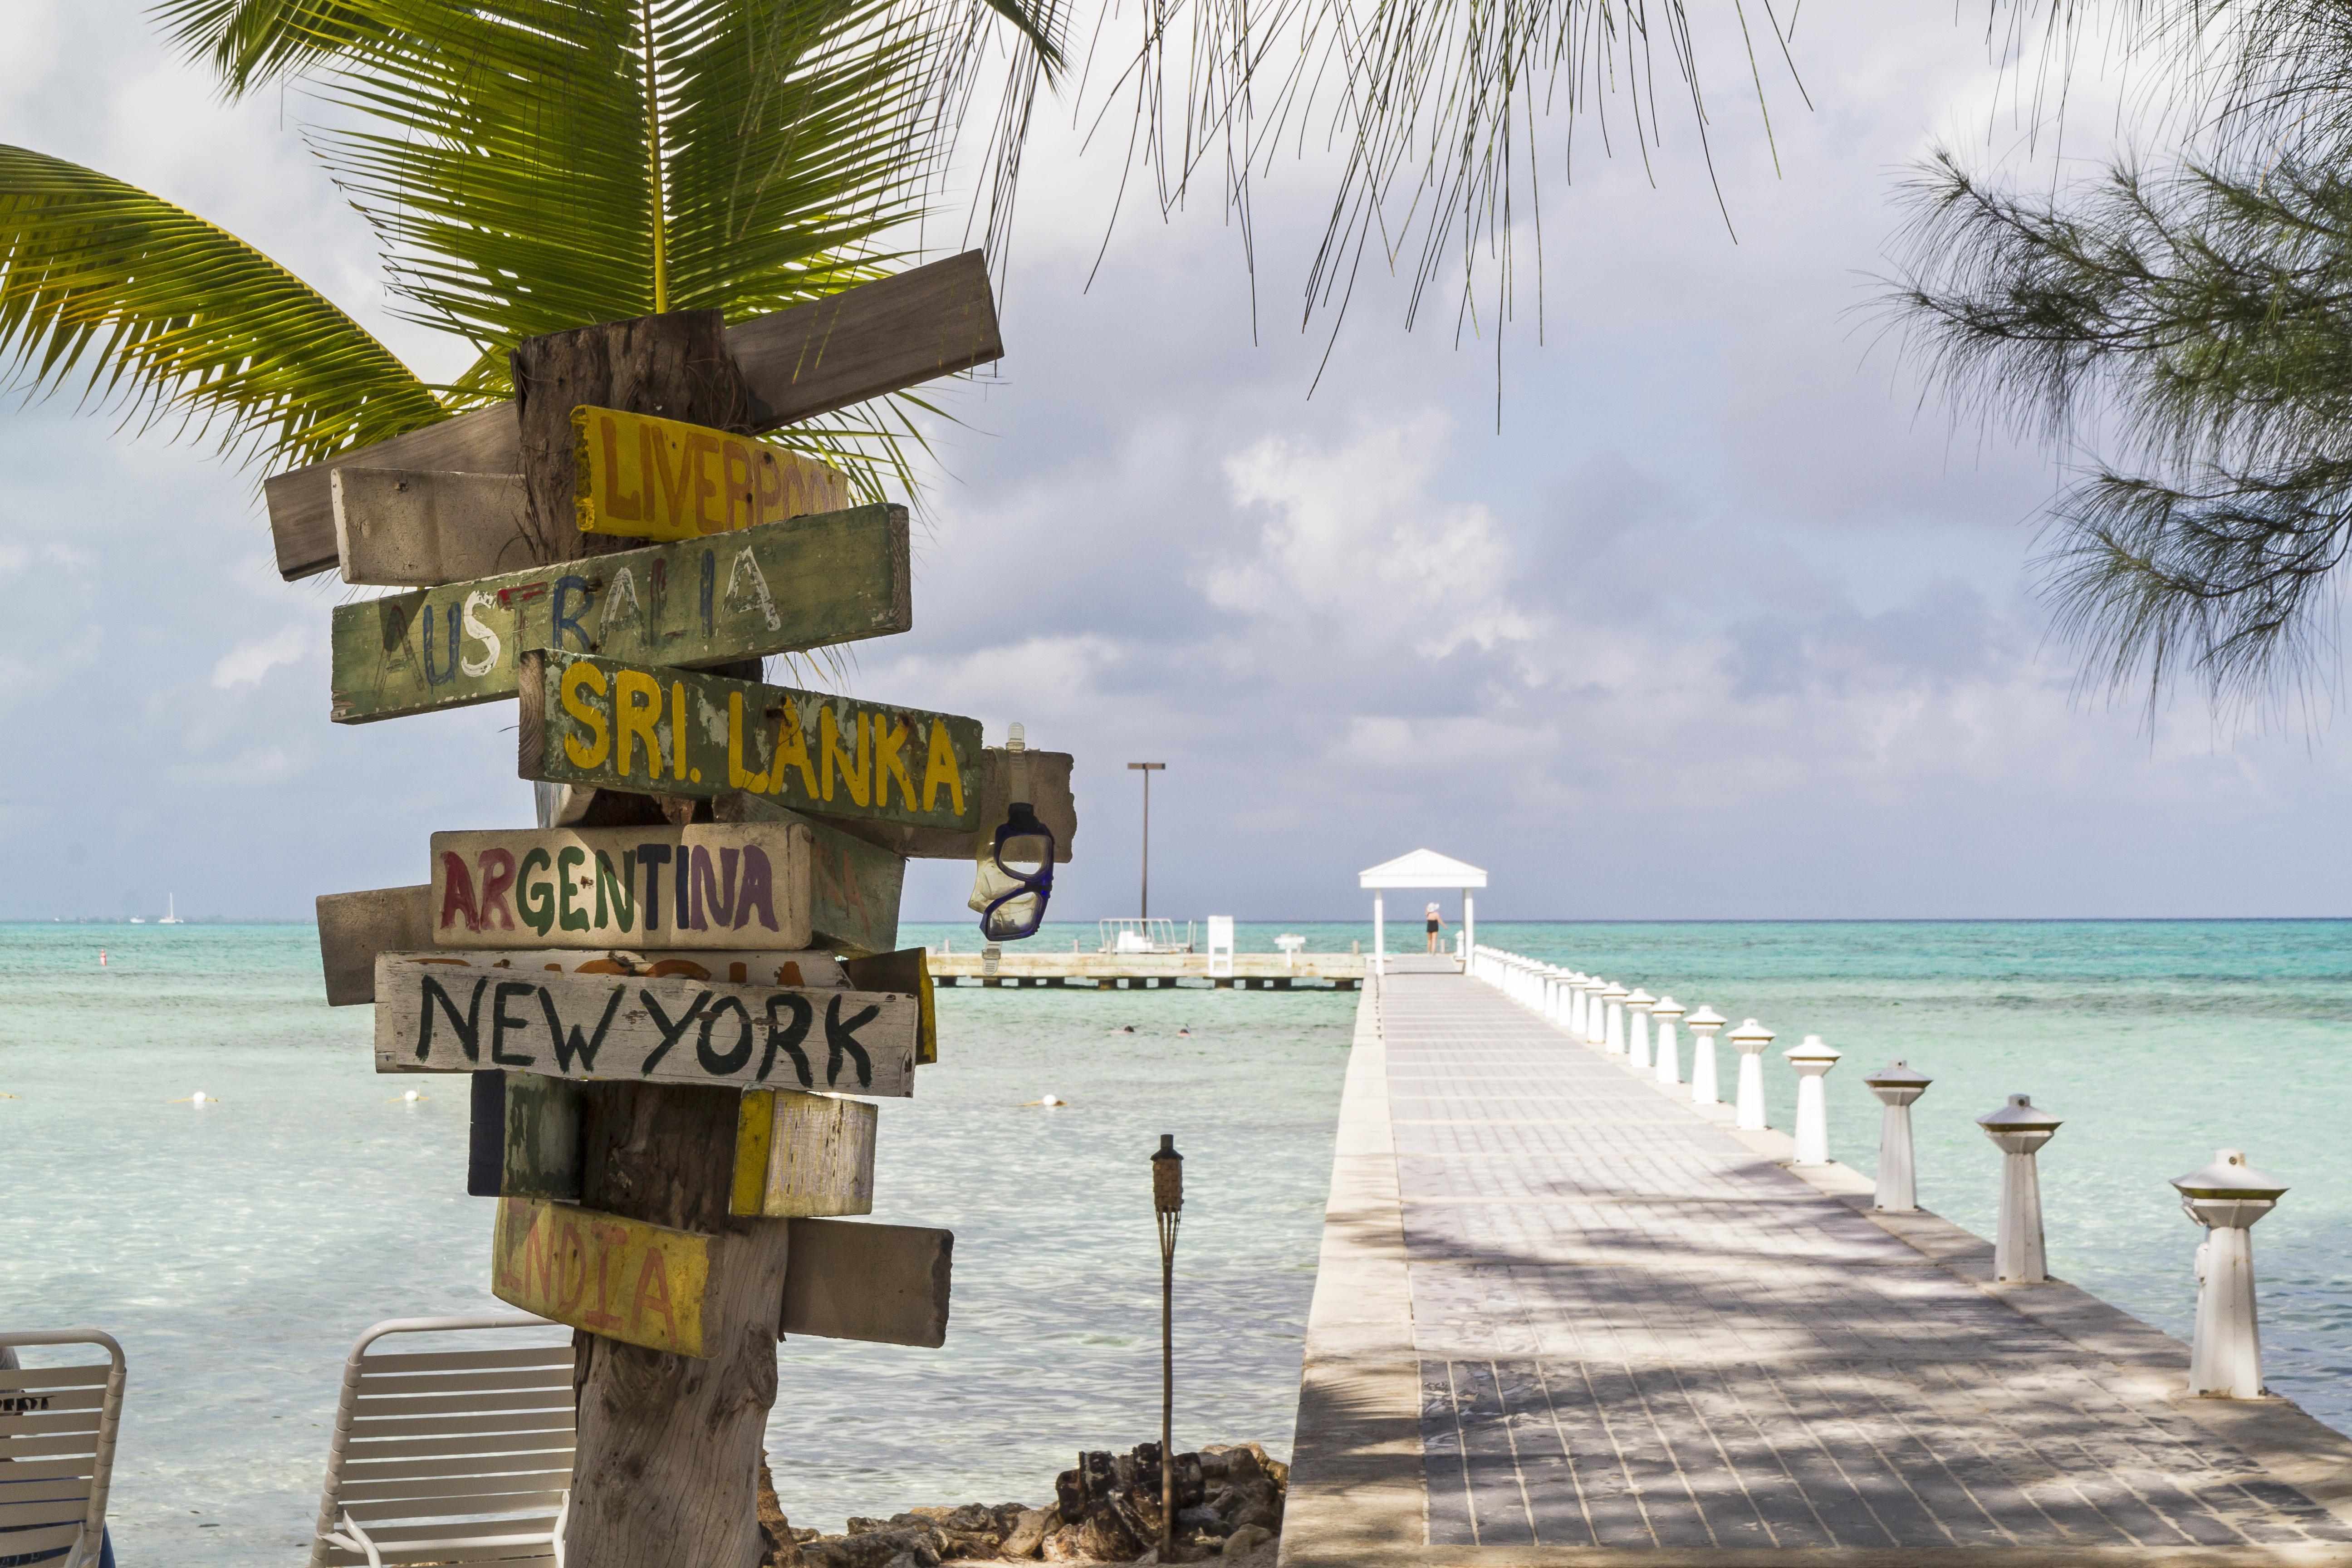 Rum Point Beach Cayman Islands